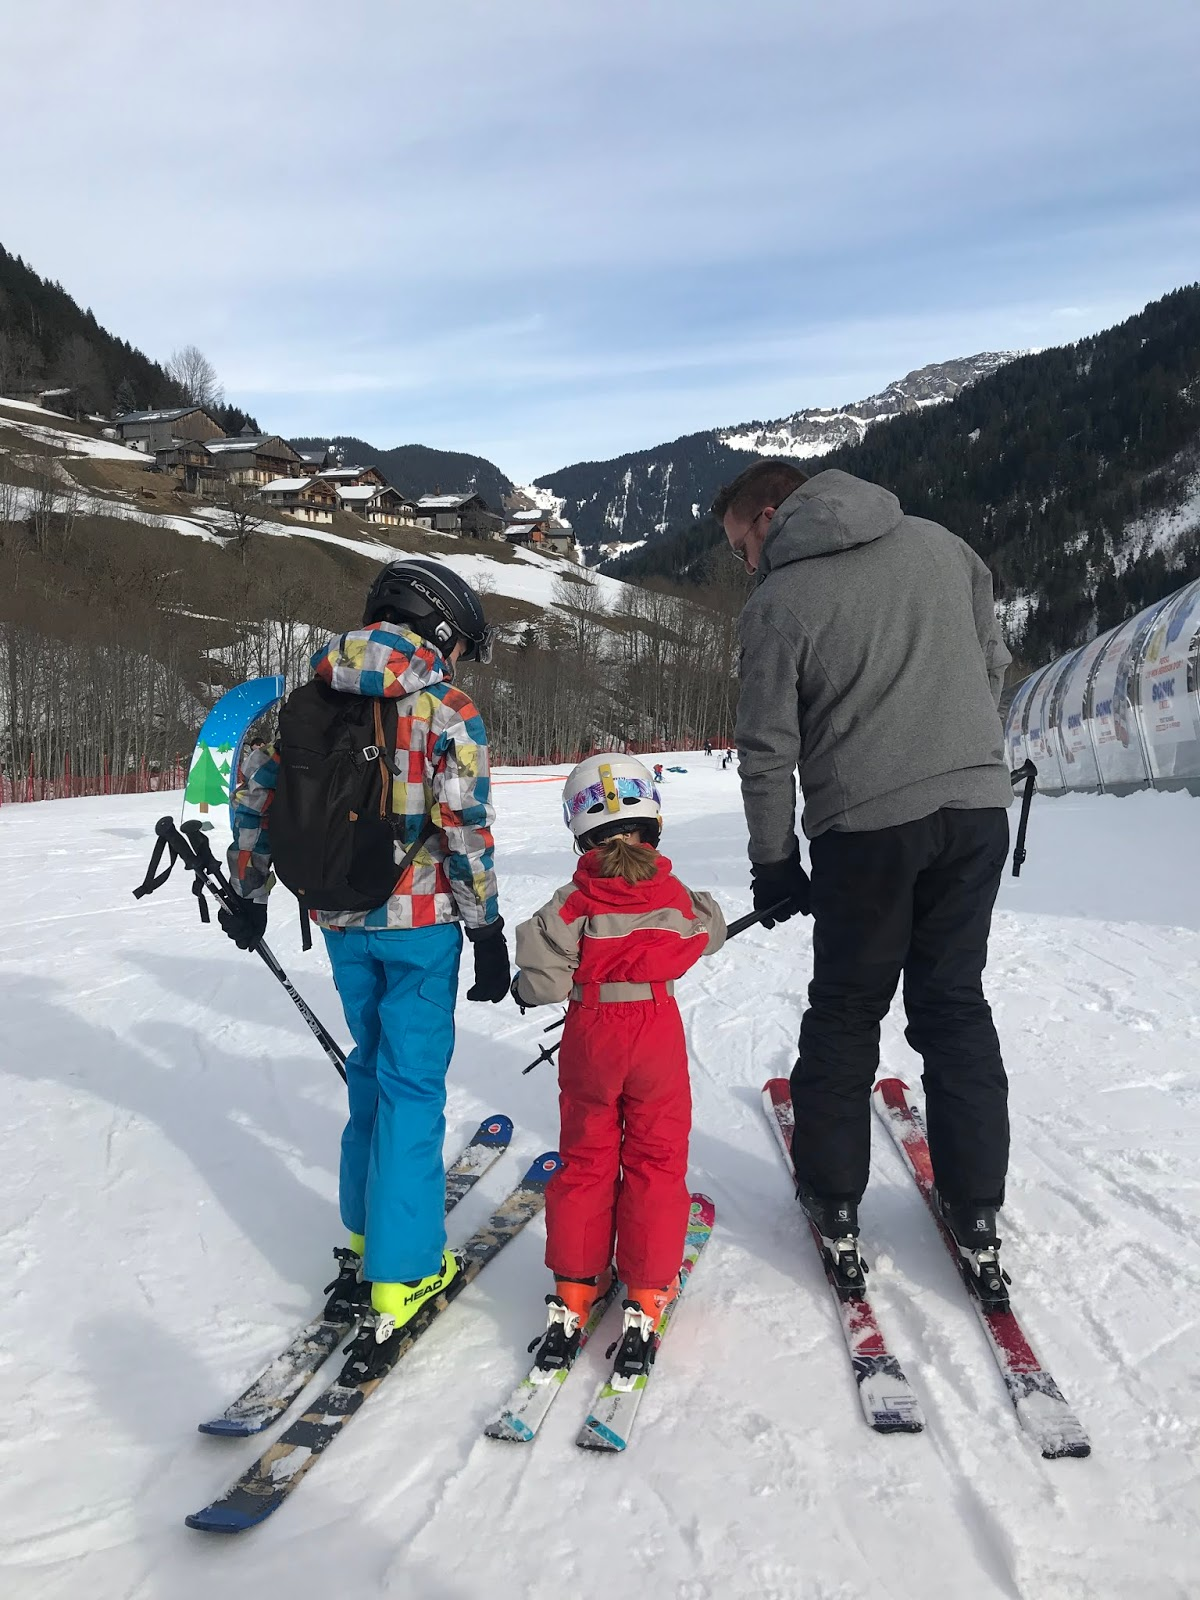 station de ski familiale